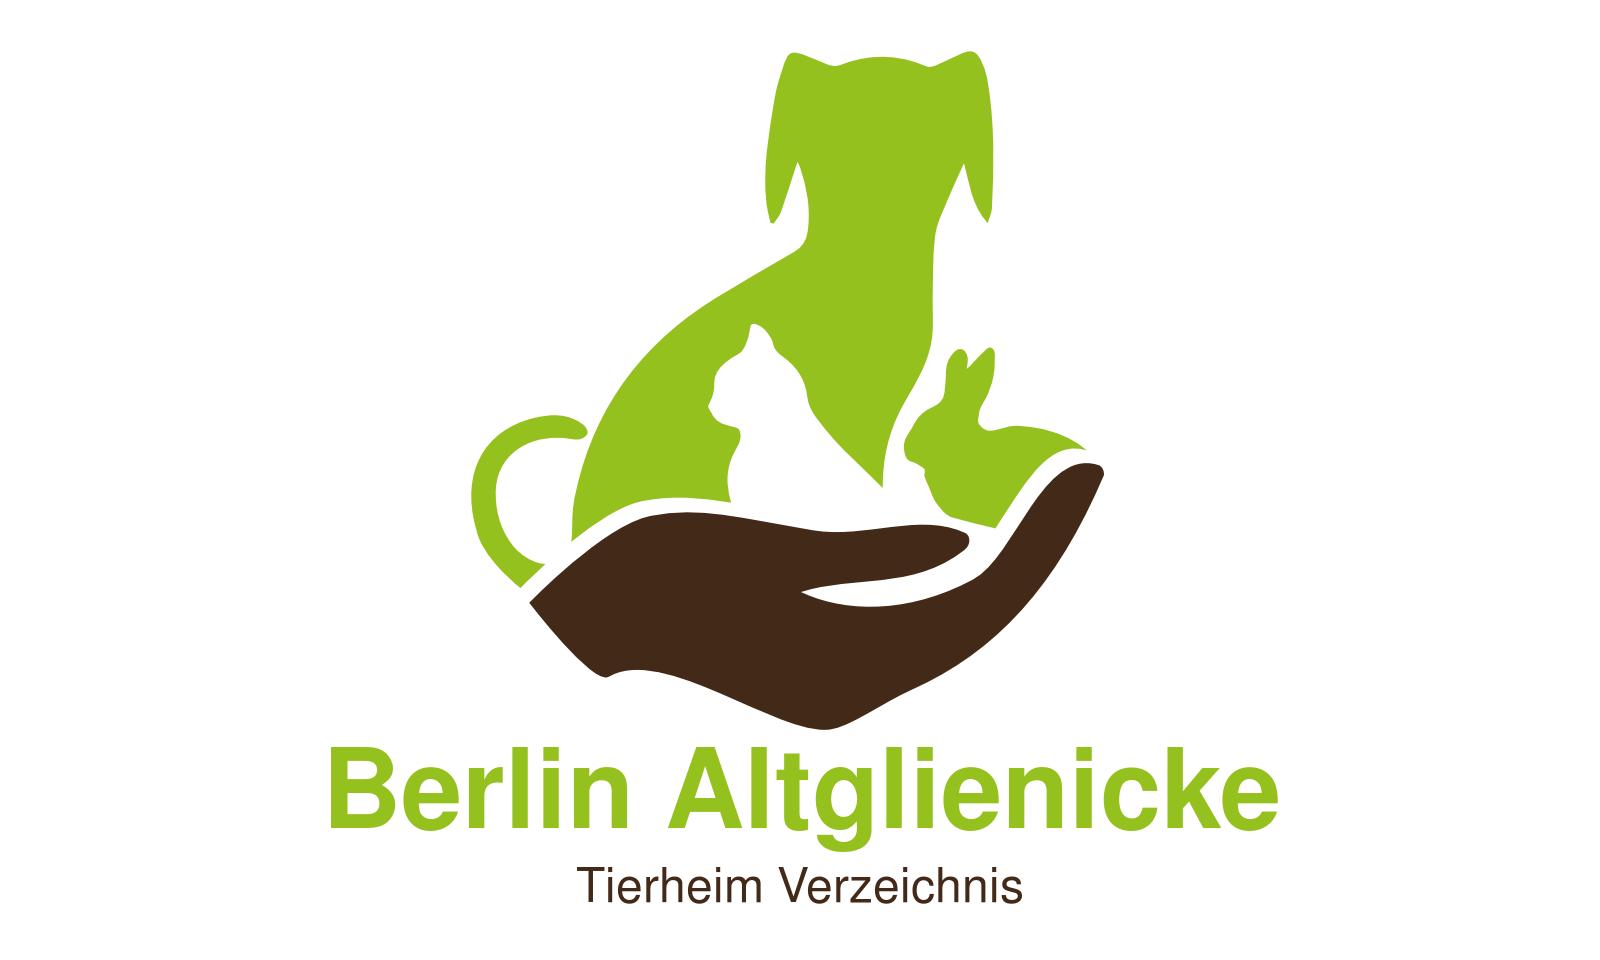 Tierheim Berlin Altglienicke